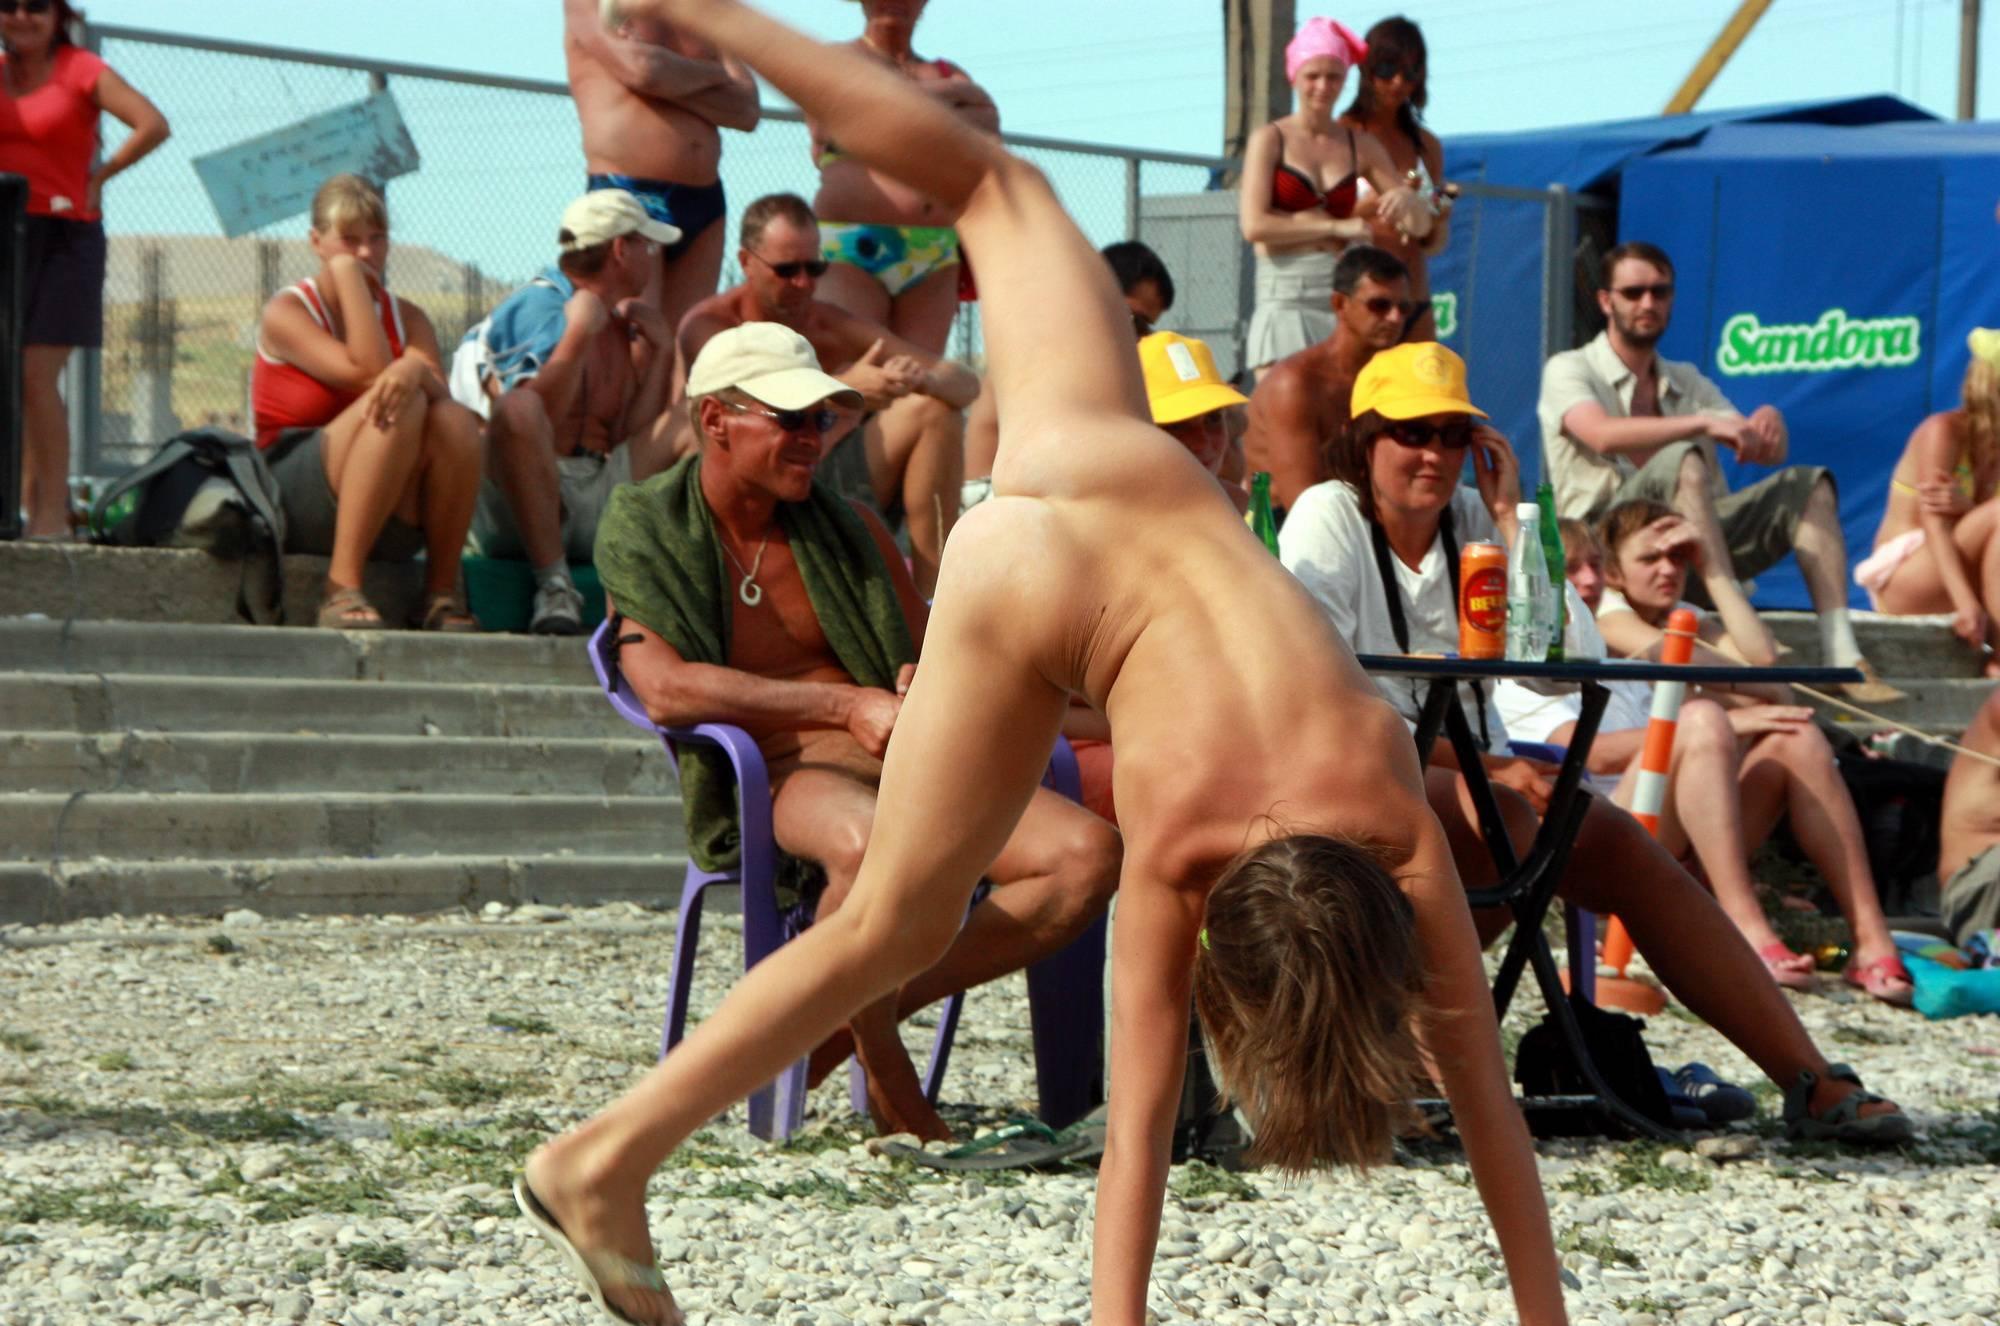 Cartwheel and Beach Dance - 3